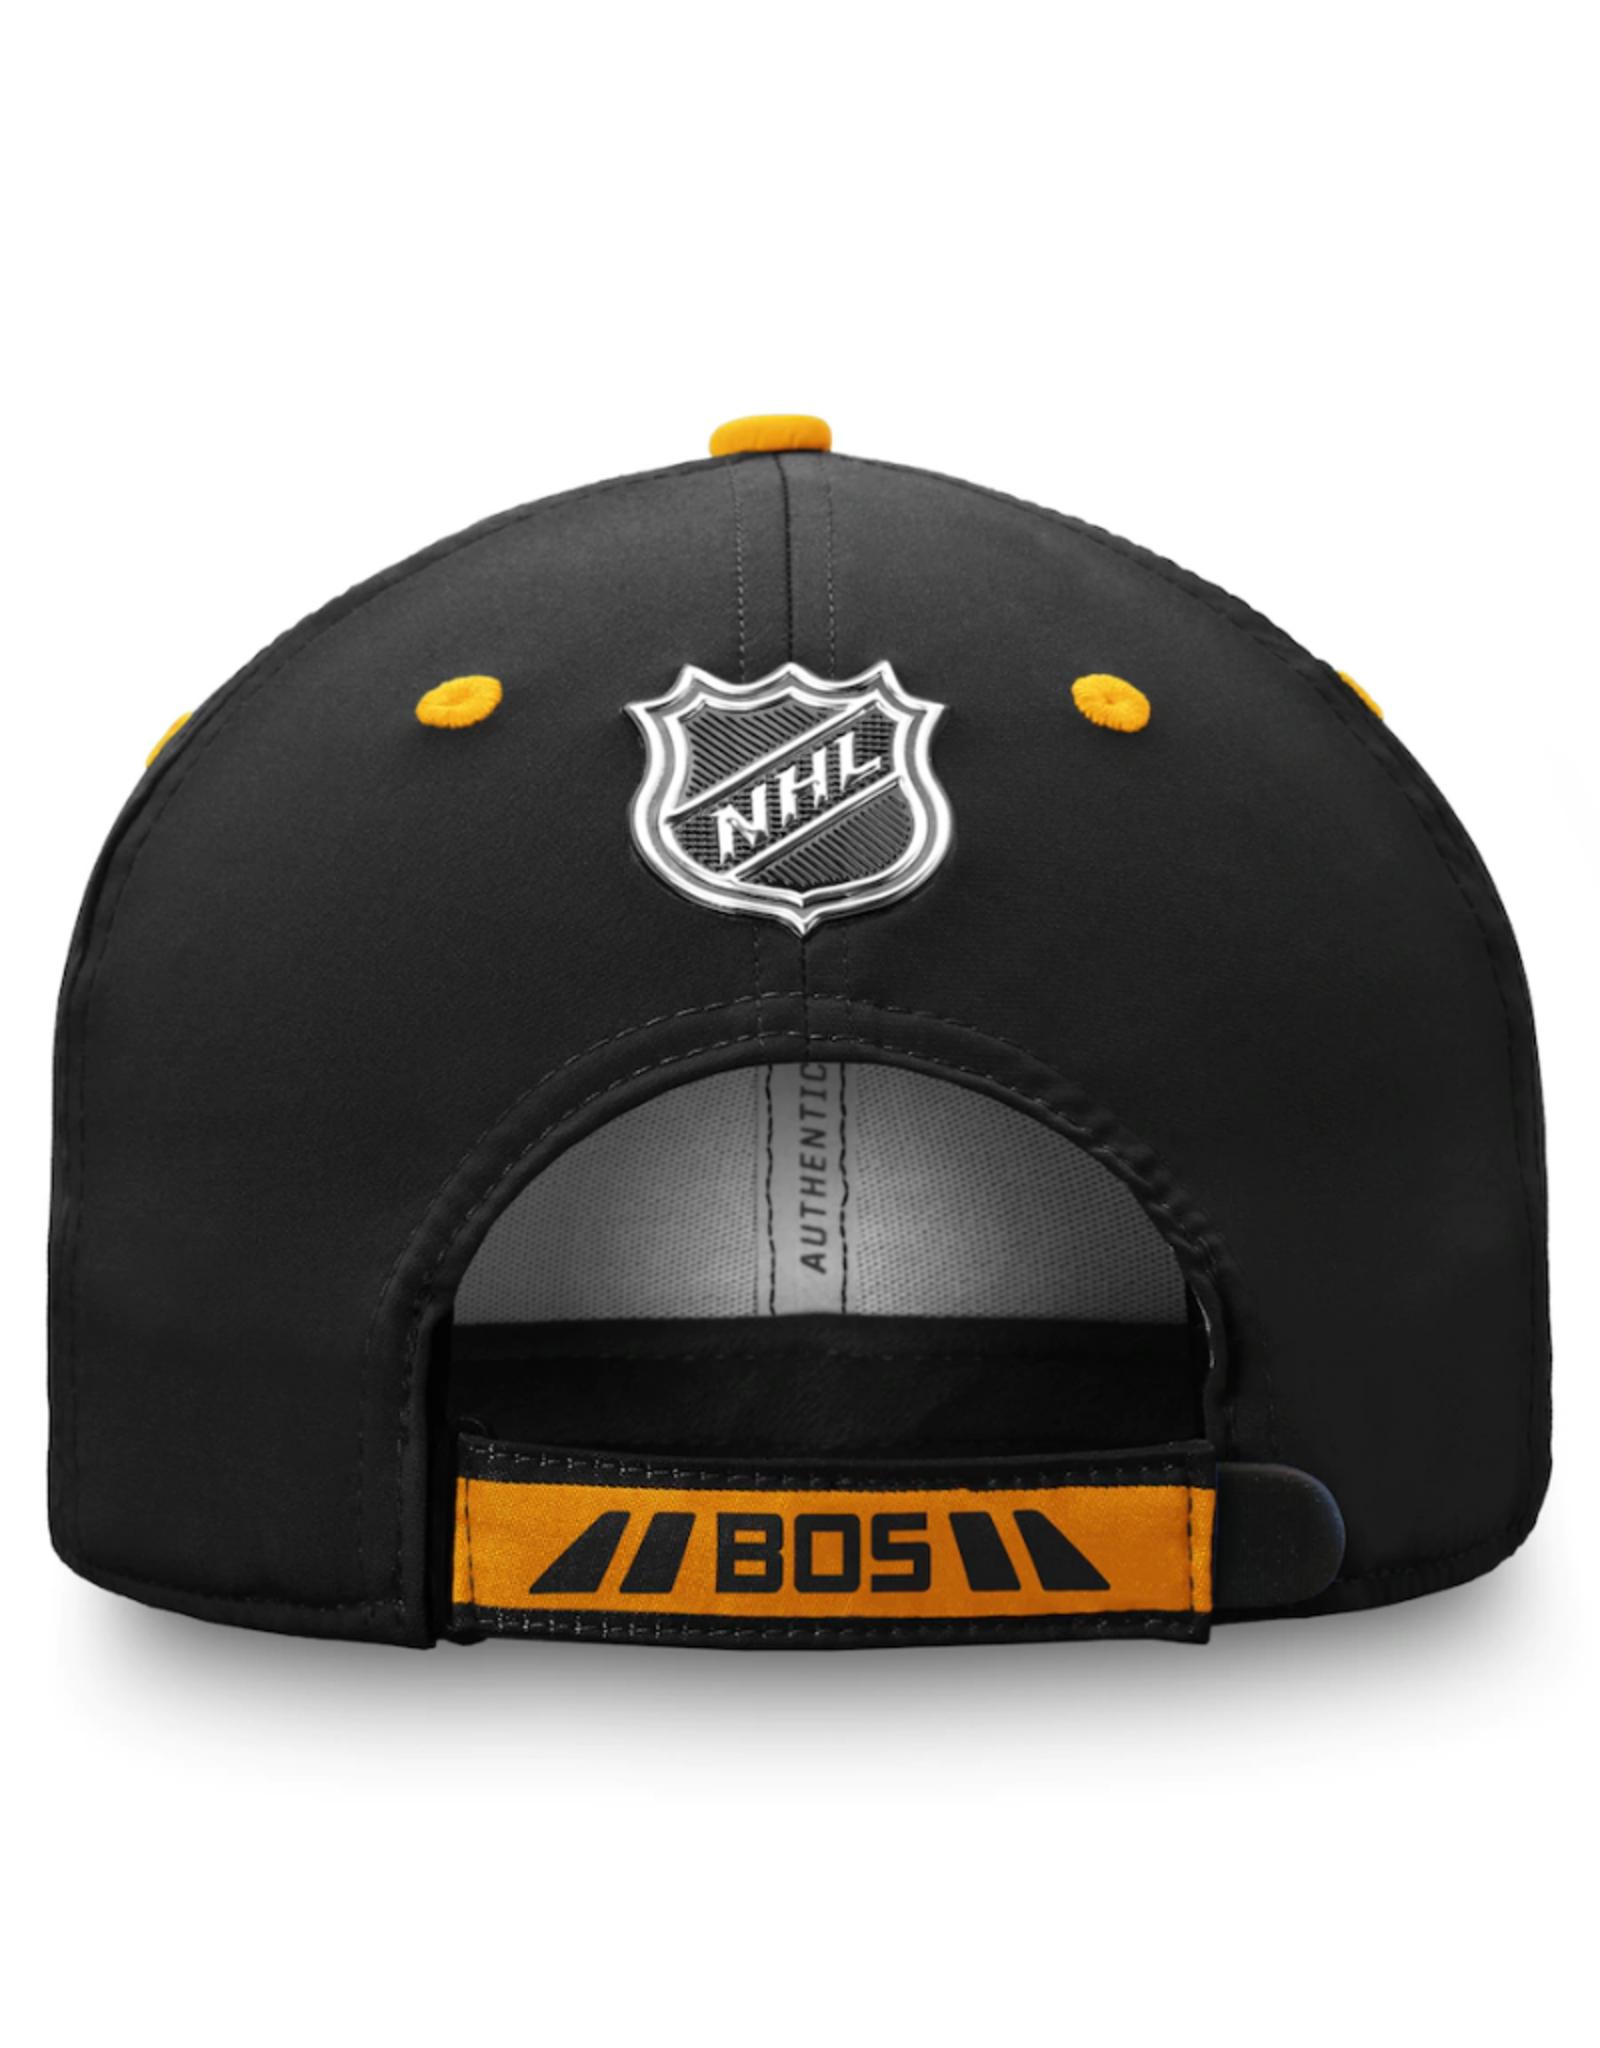 Fanatics NHL Youth Authentic Pro Adjustable Hat Boston Bruins